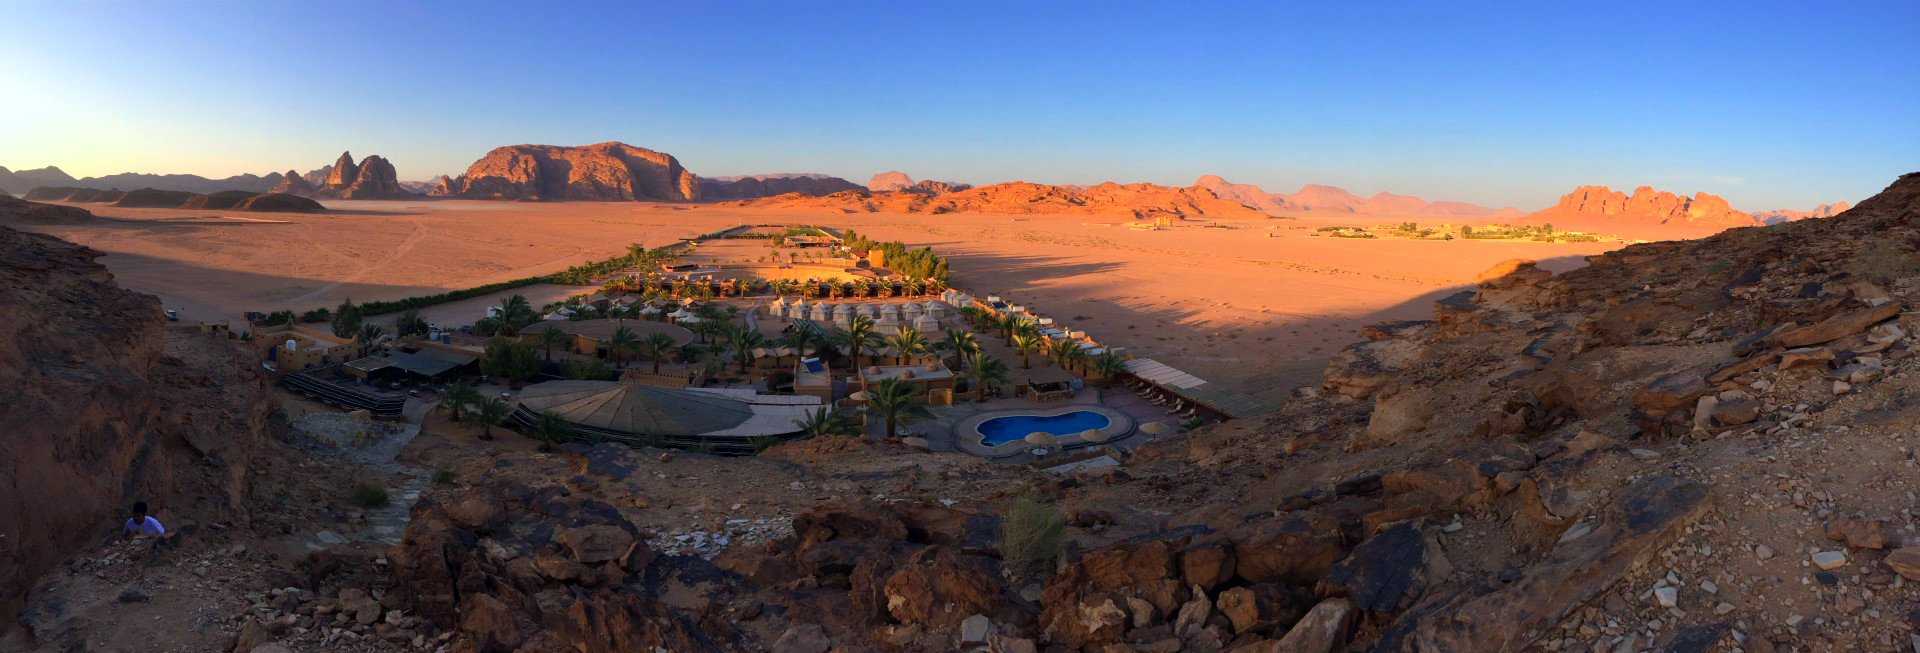 Viajar a Jordania - Ruta por Jordania en una semana - Viajes a Jordania jordania en una semana - 28254696476 2c360d8331 o - Ruta por Jordania en una semana